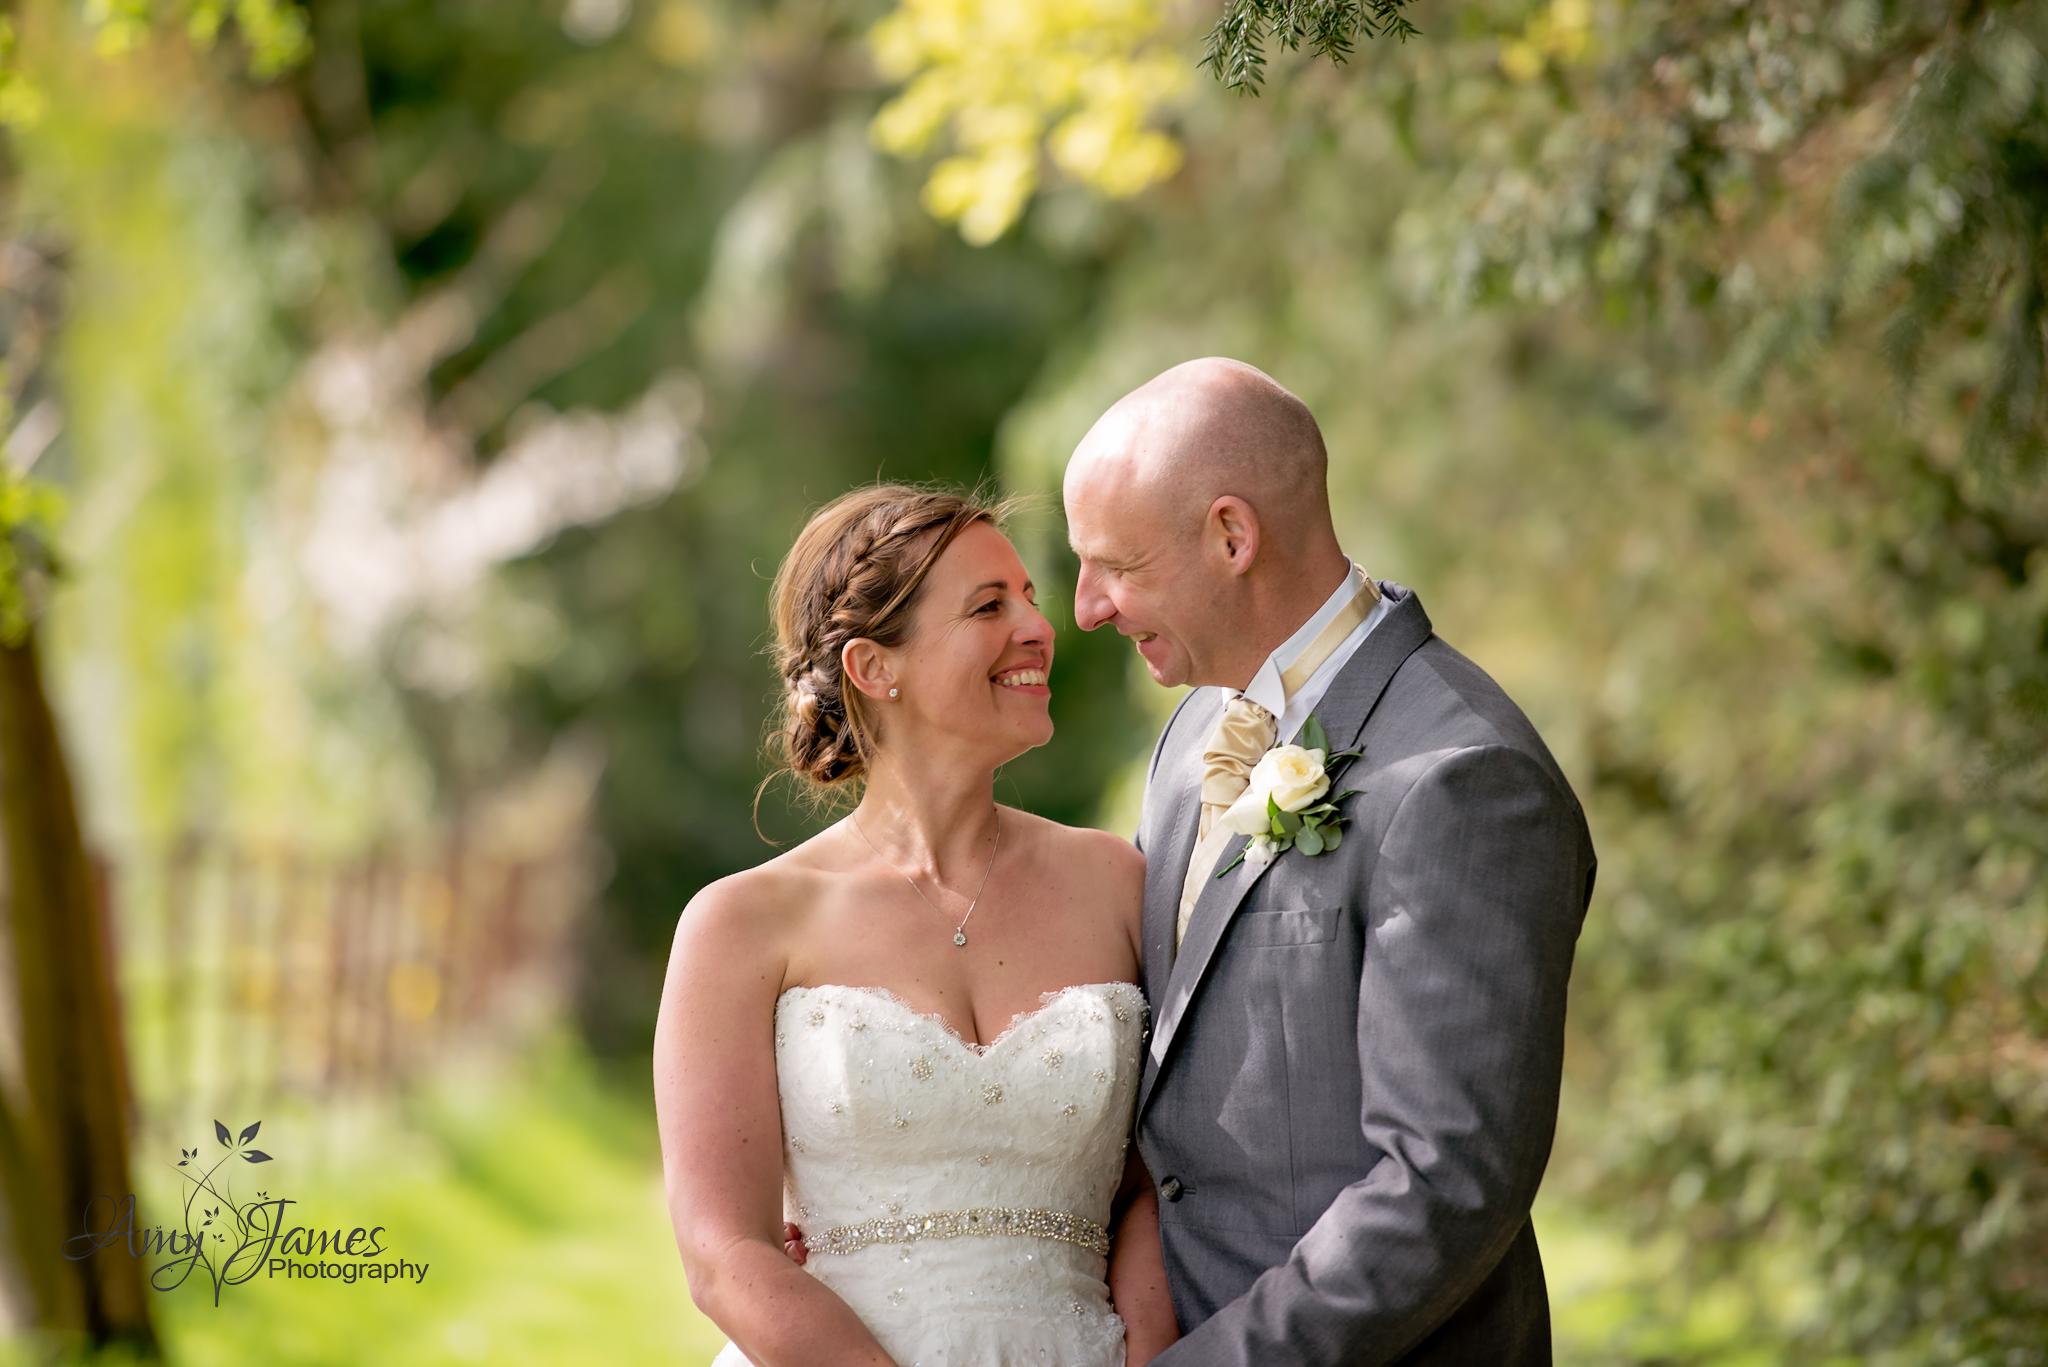 Amy James Photography / Wedding Photographer Hampshire / Hampshire Wedding Venues / Surrey Wedding Venues / Audleys Wood Hotel Wedding / Basingstoke Wedding